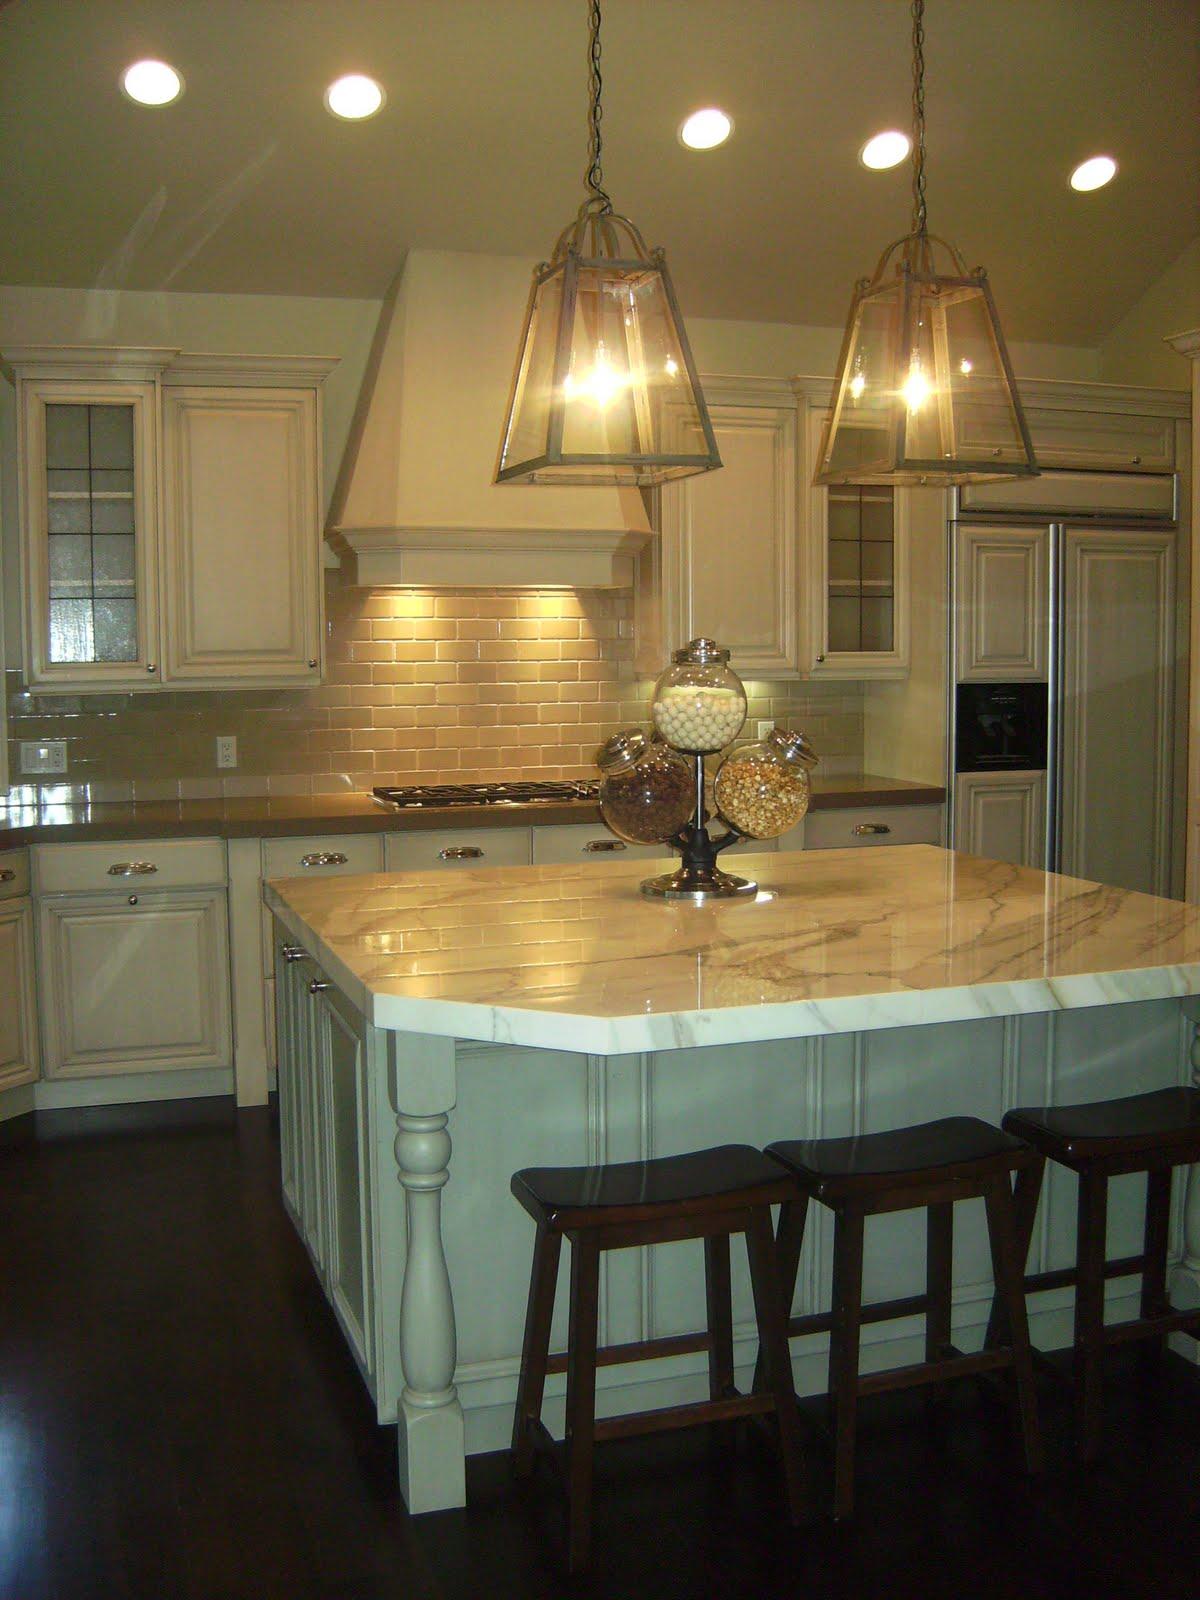 Lantern Kitchen Pendants With